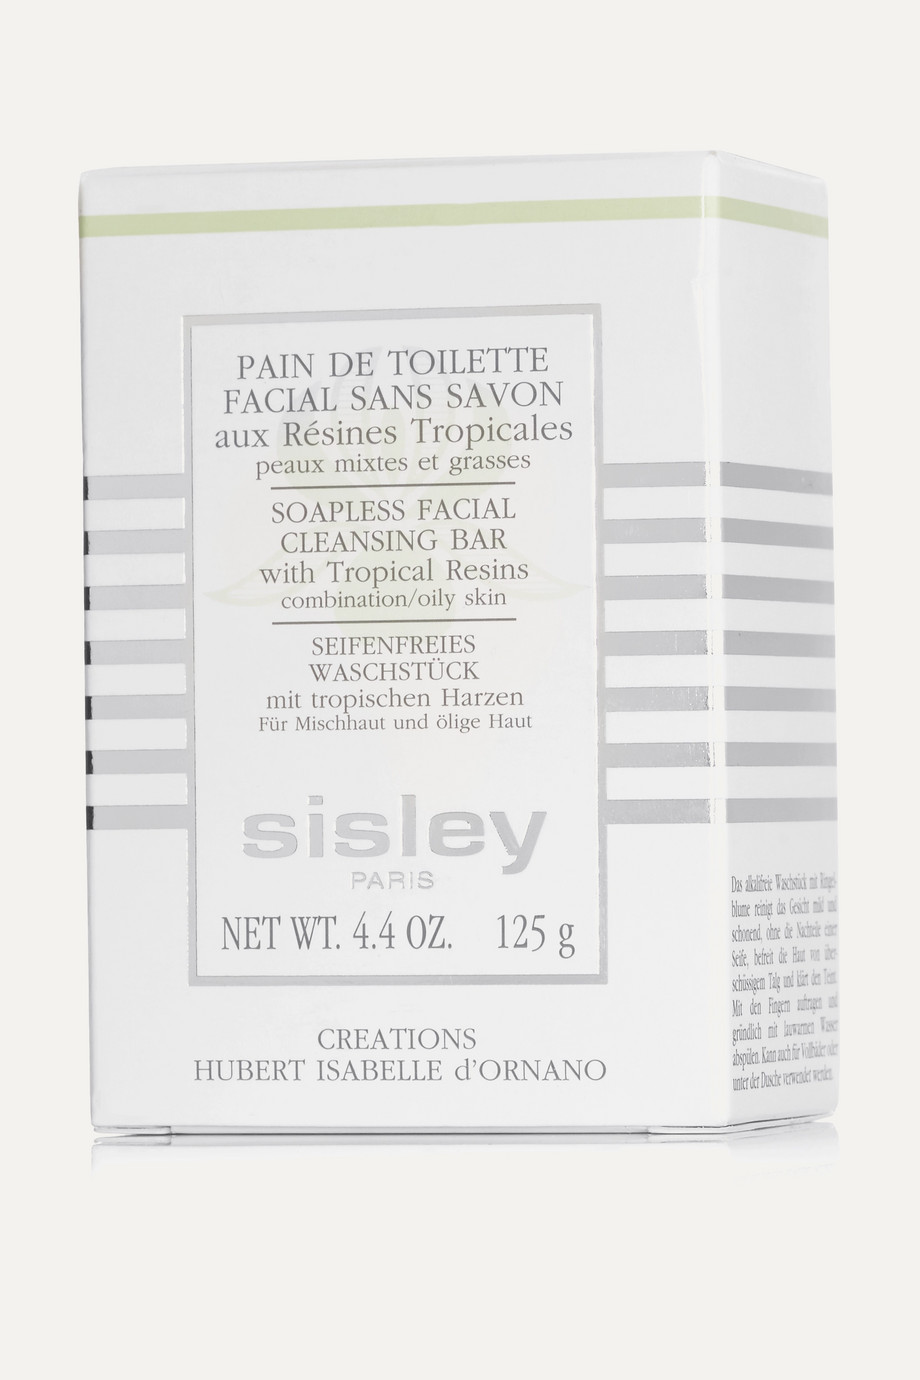 Sisley Soapless Facial Cleansing Bar, 125g